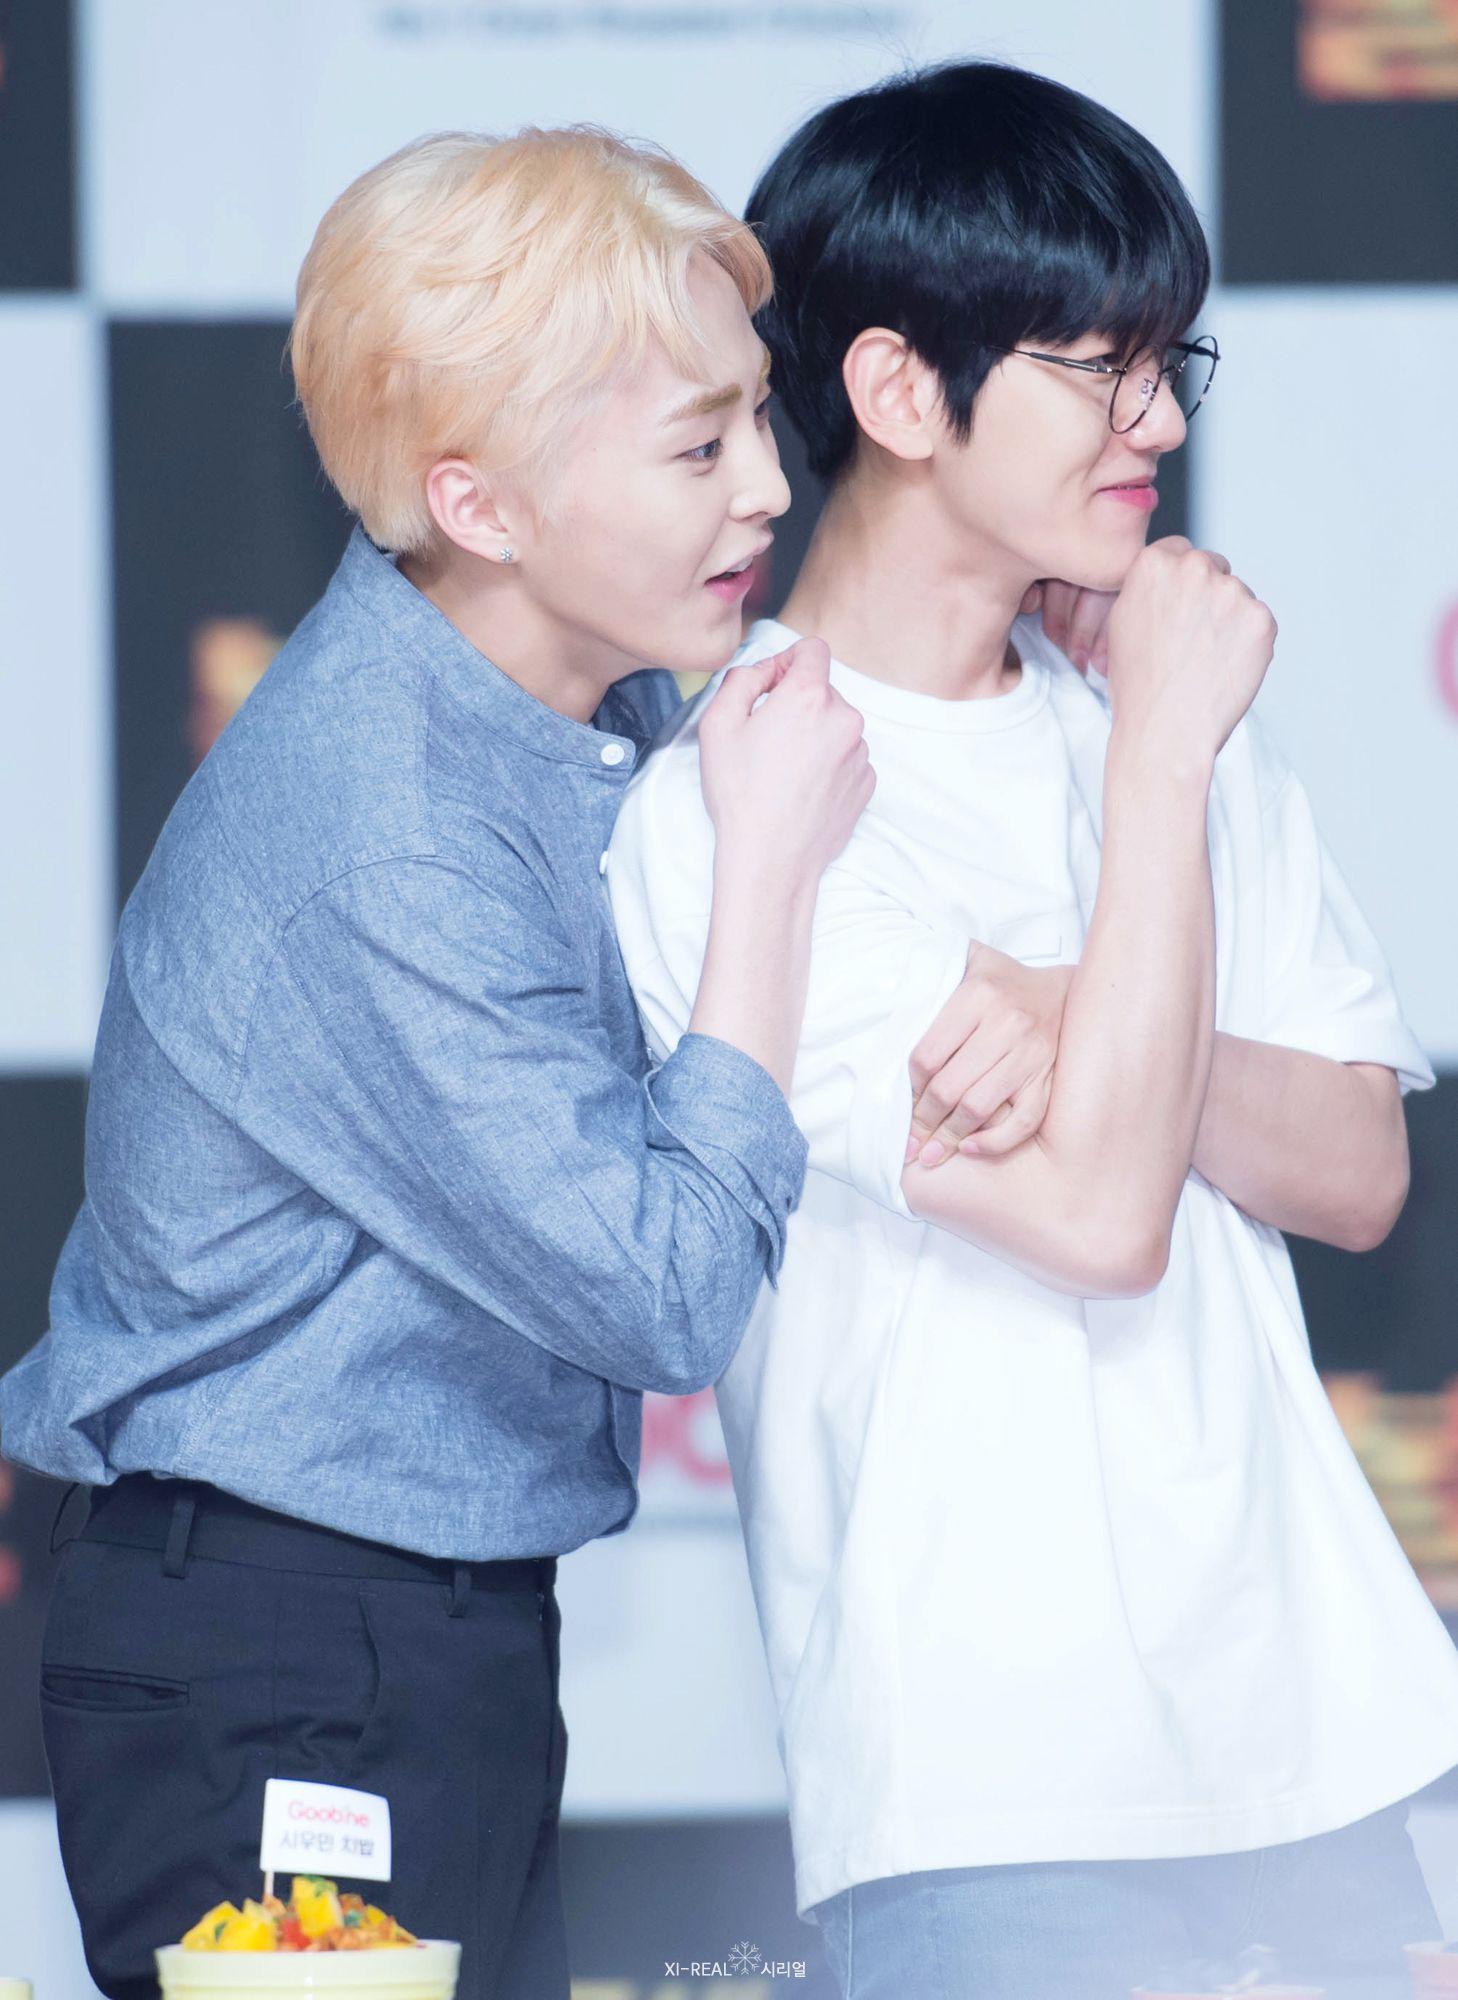 160629 #Xiumin #Baekhyun #EXO   EXO   Exo, Exo xiumin, Baekhyun